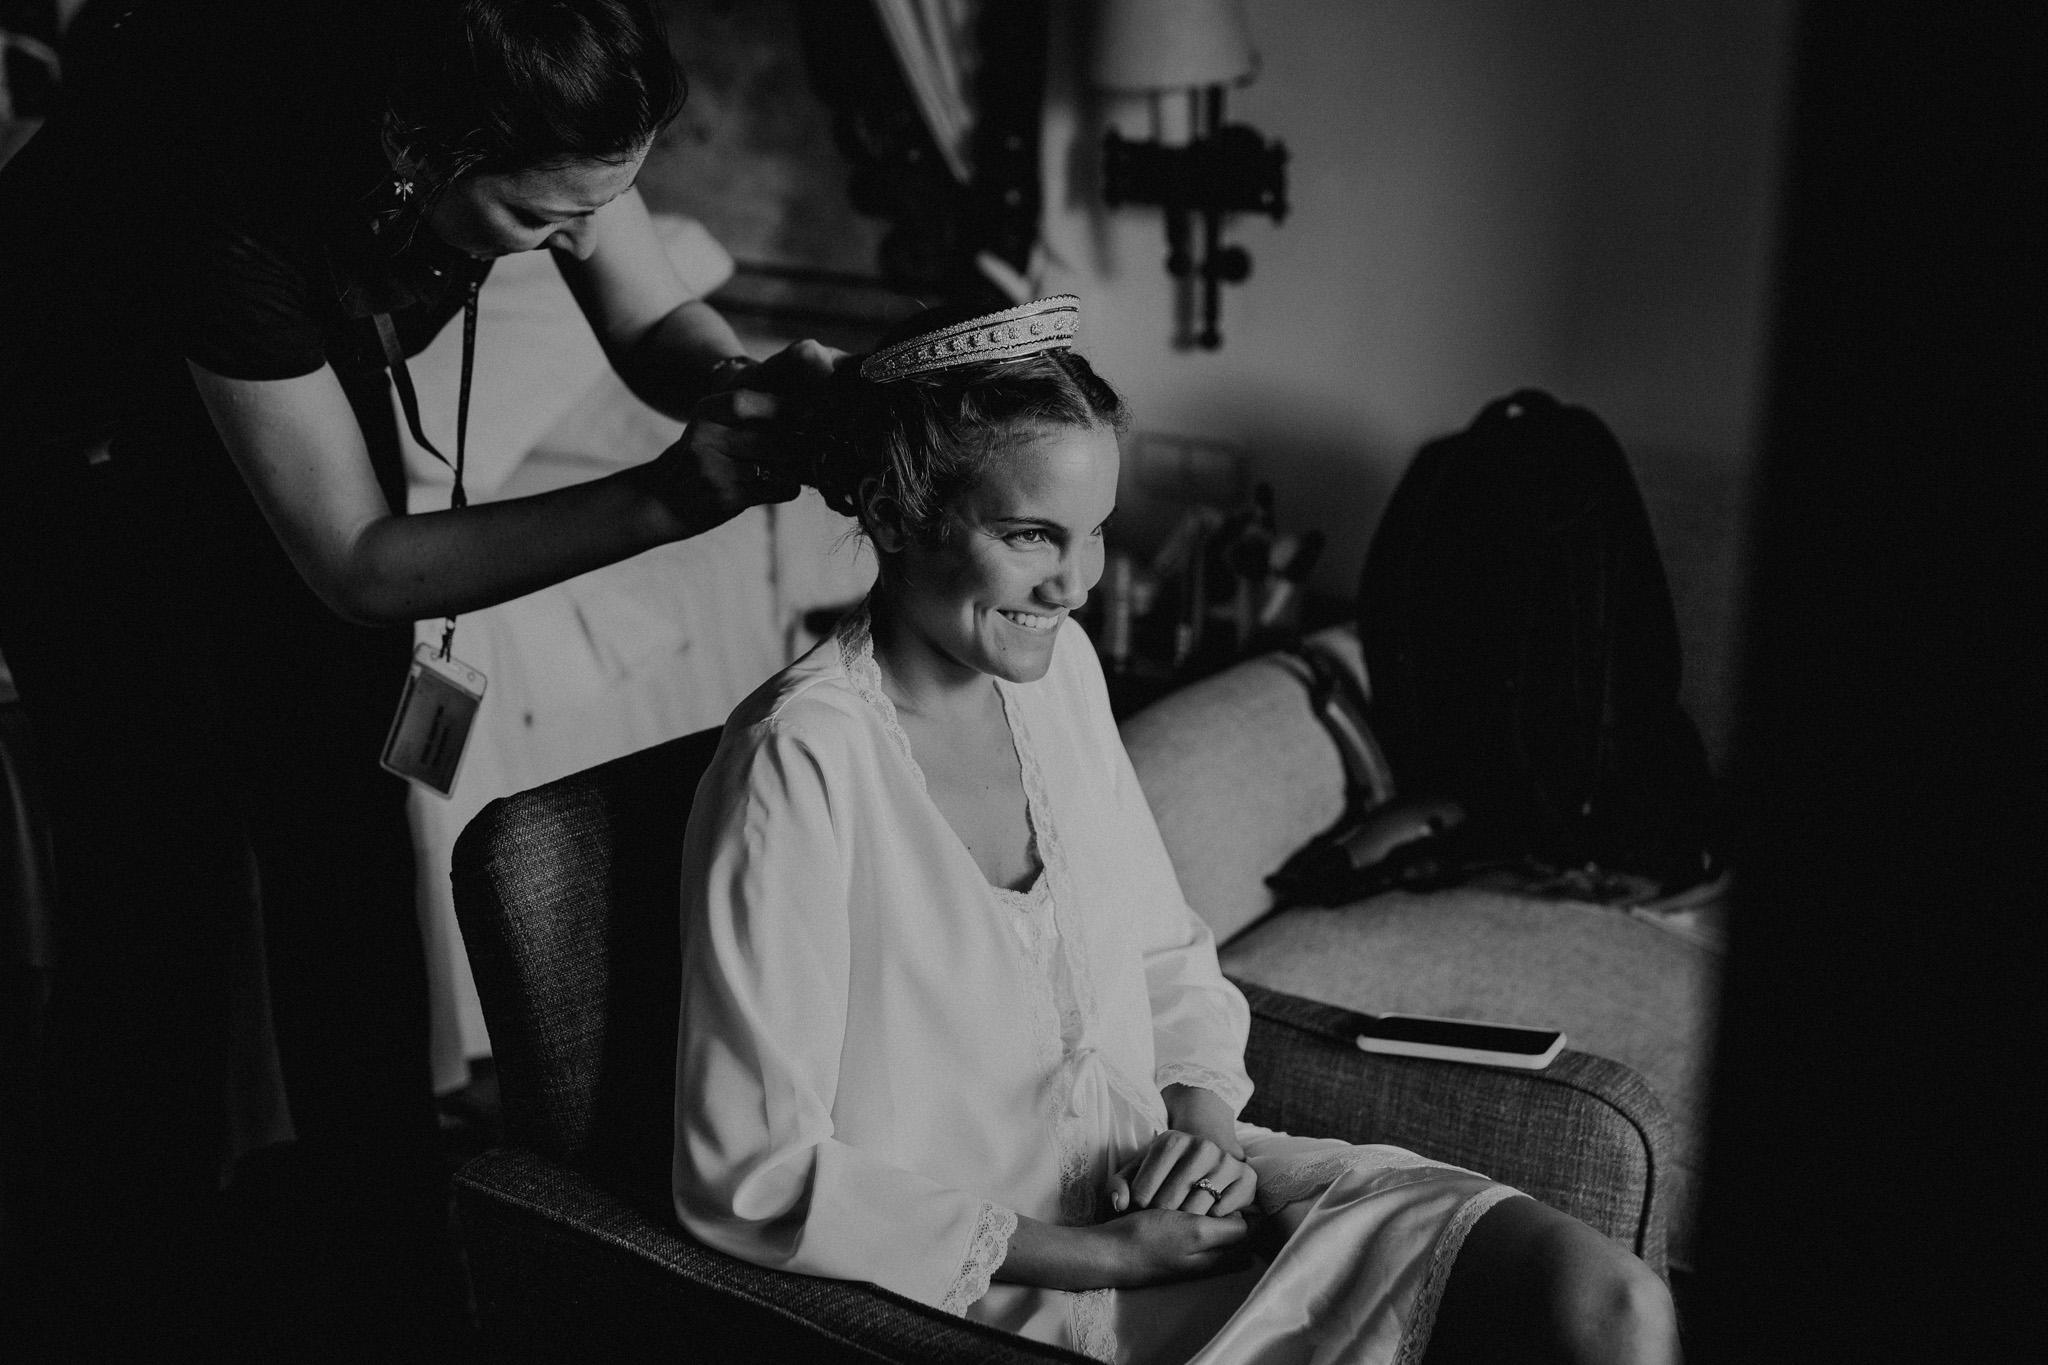 fotografia-boda-wedding-photographer-spain-concorazon-16